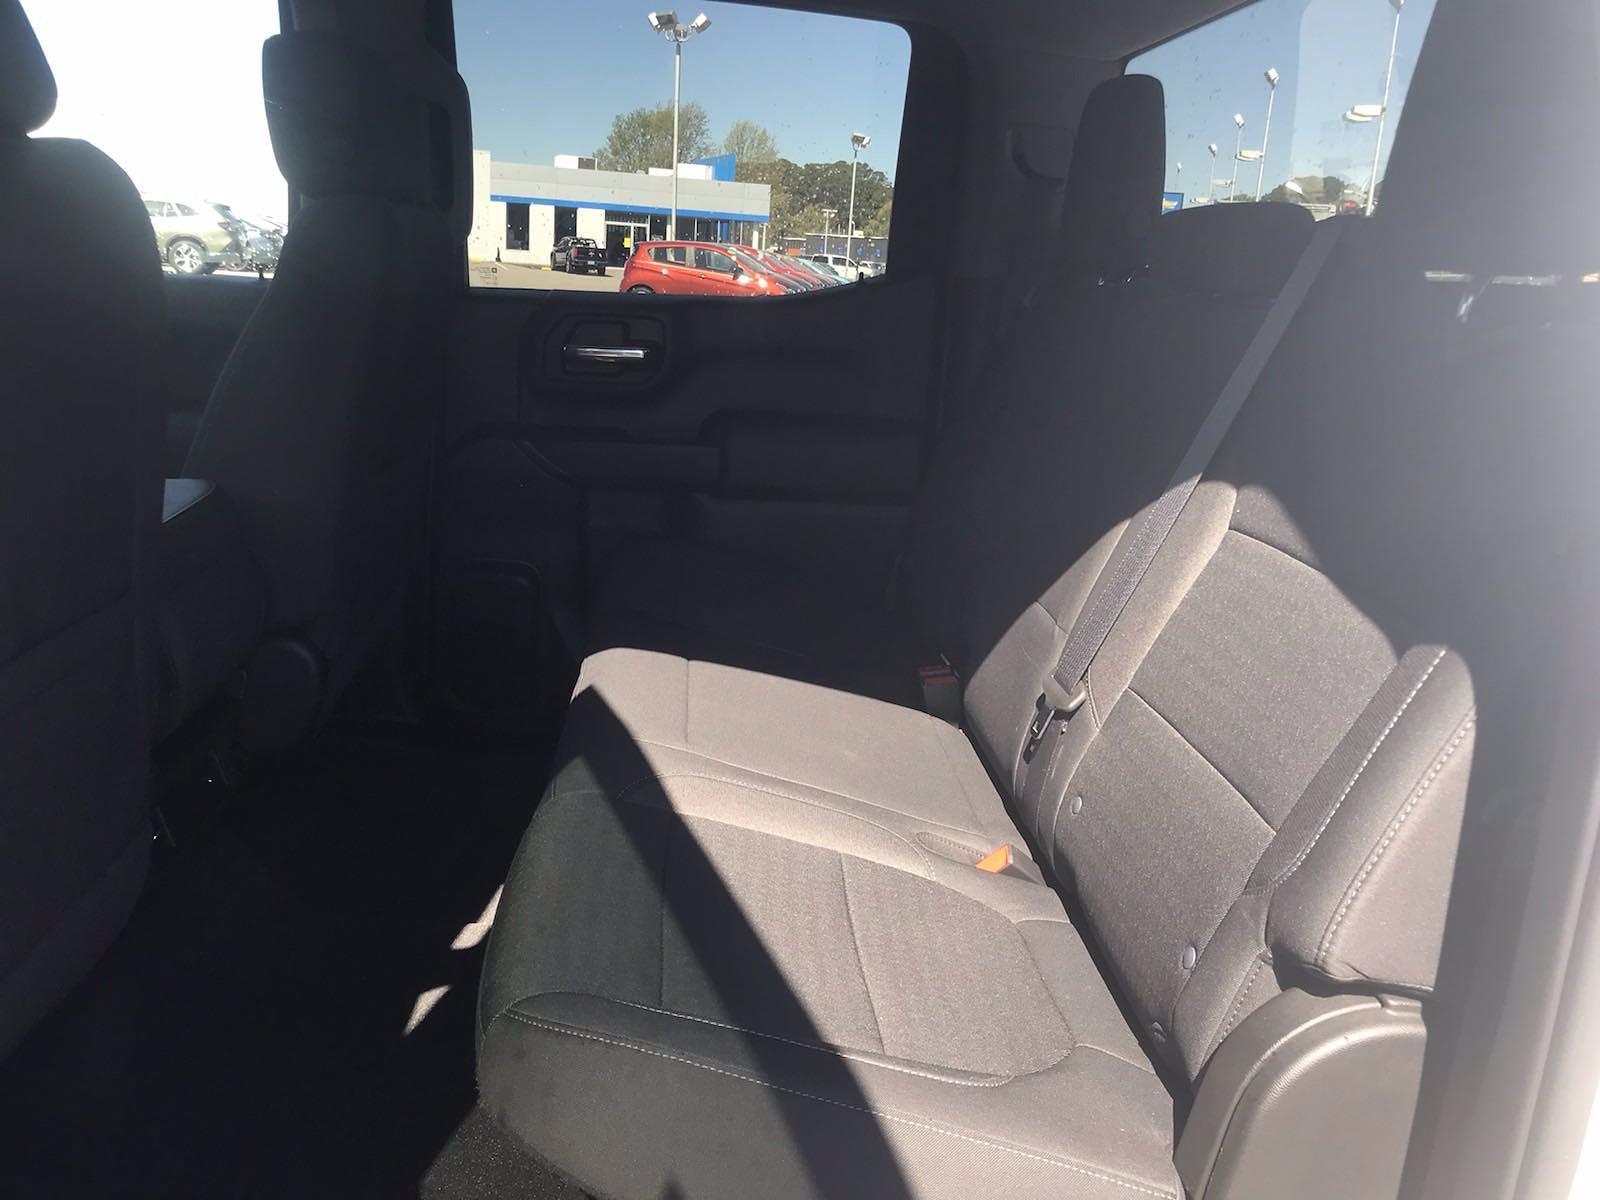 2020 Chevrolet Silverado 1500 Crew Cab 4x4, Pickup #16423PN - photo 38